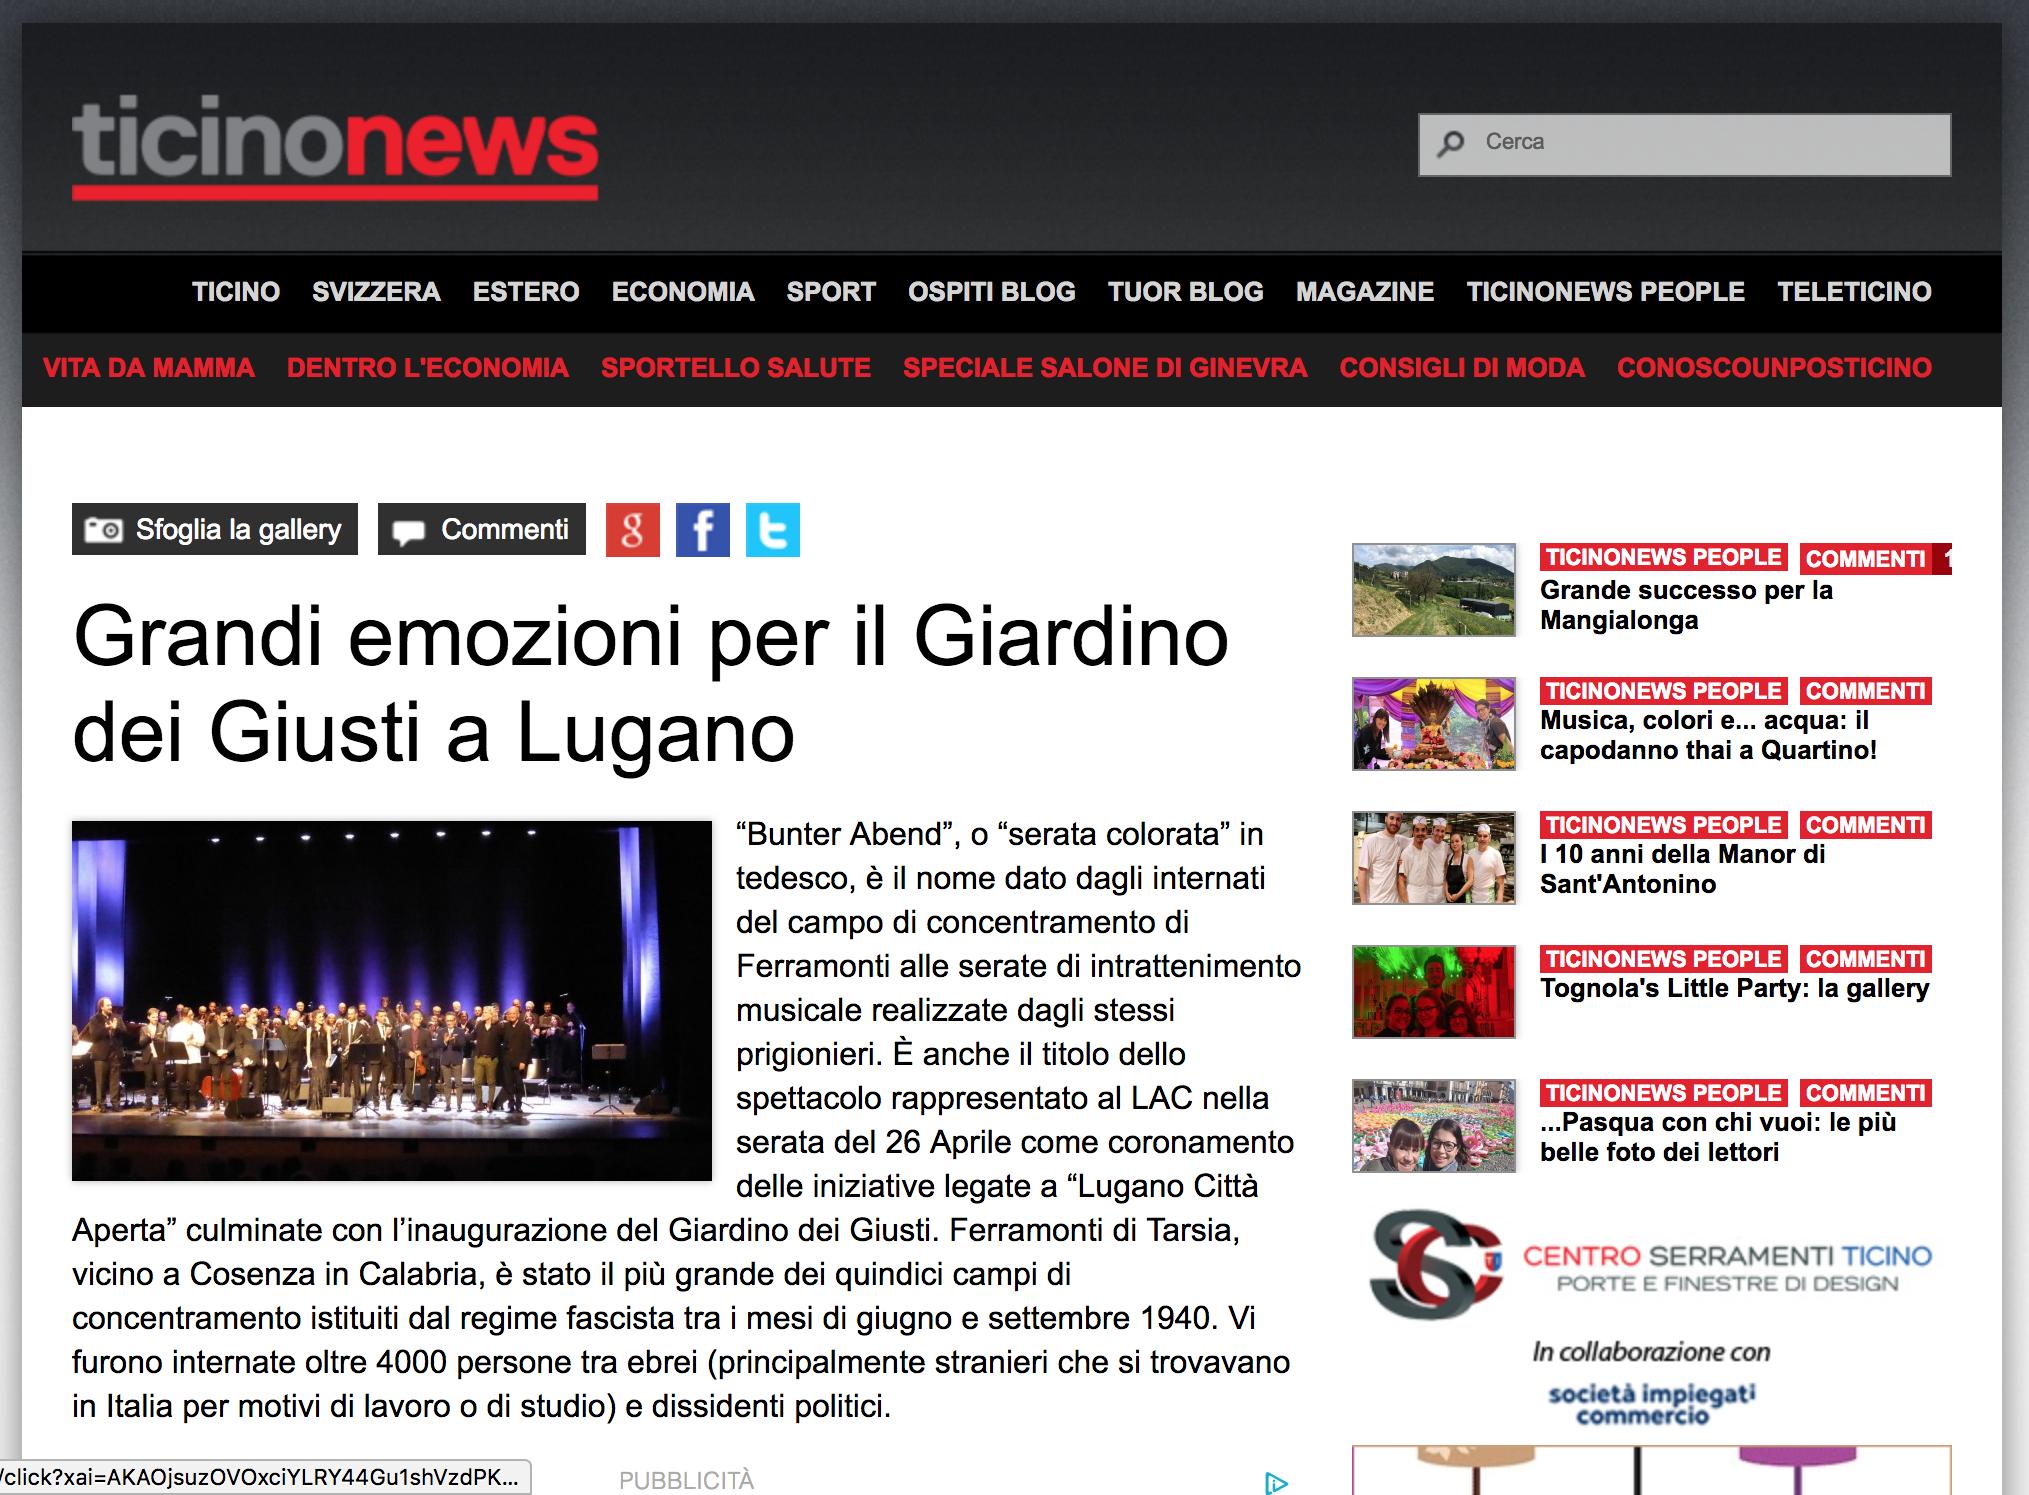 30.04.18 - Ticinonews